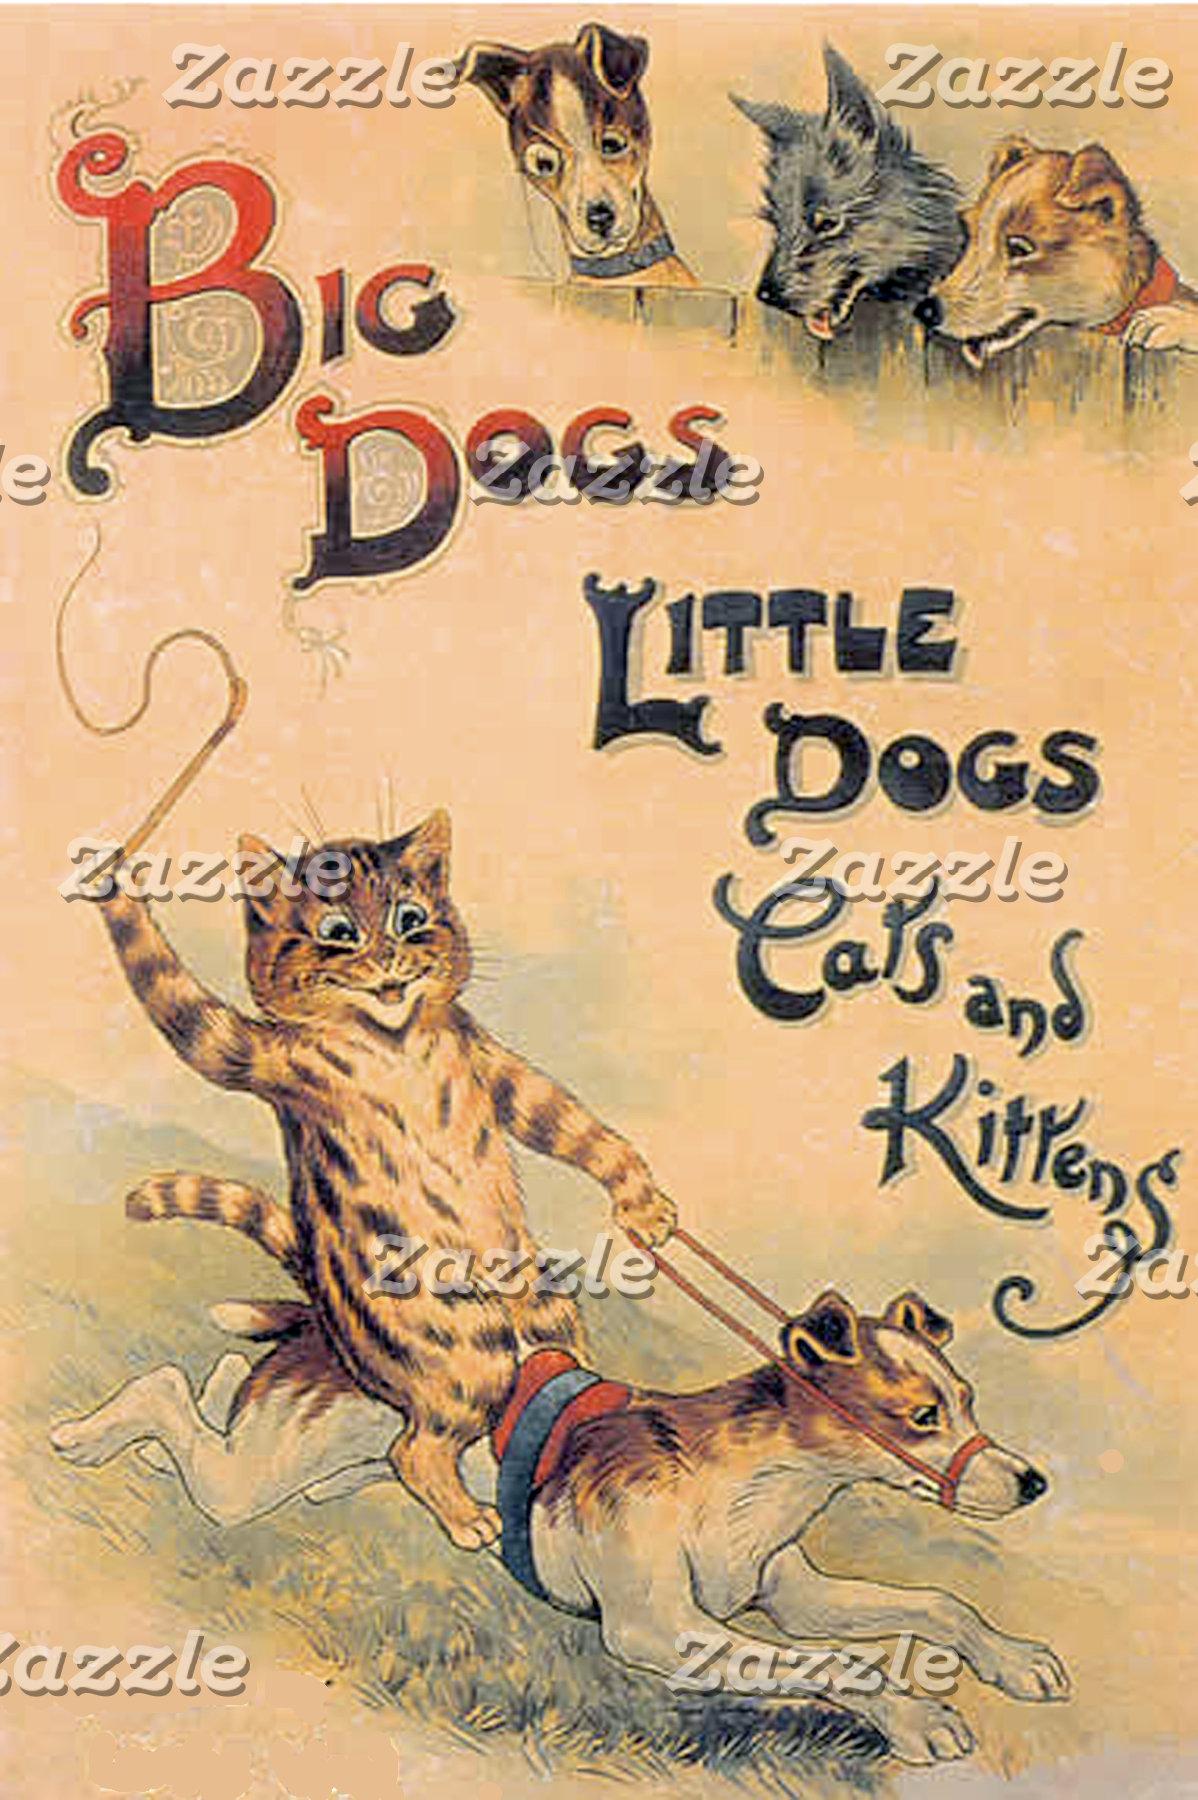 Big Dogs Little Dogs (Vintage Image)